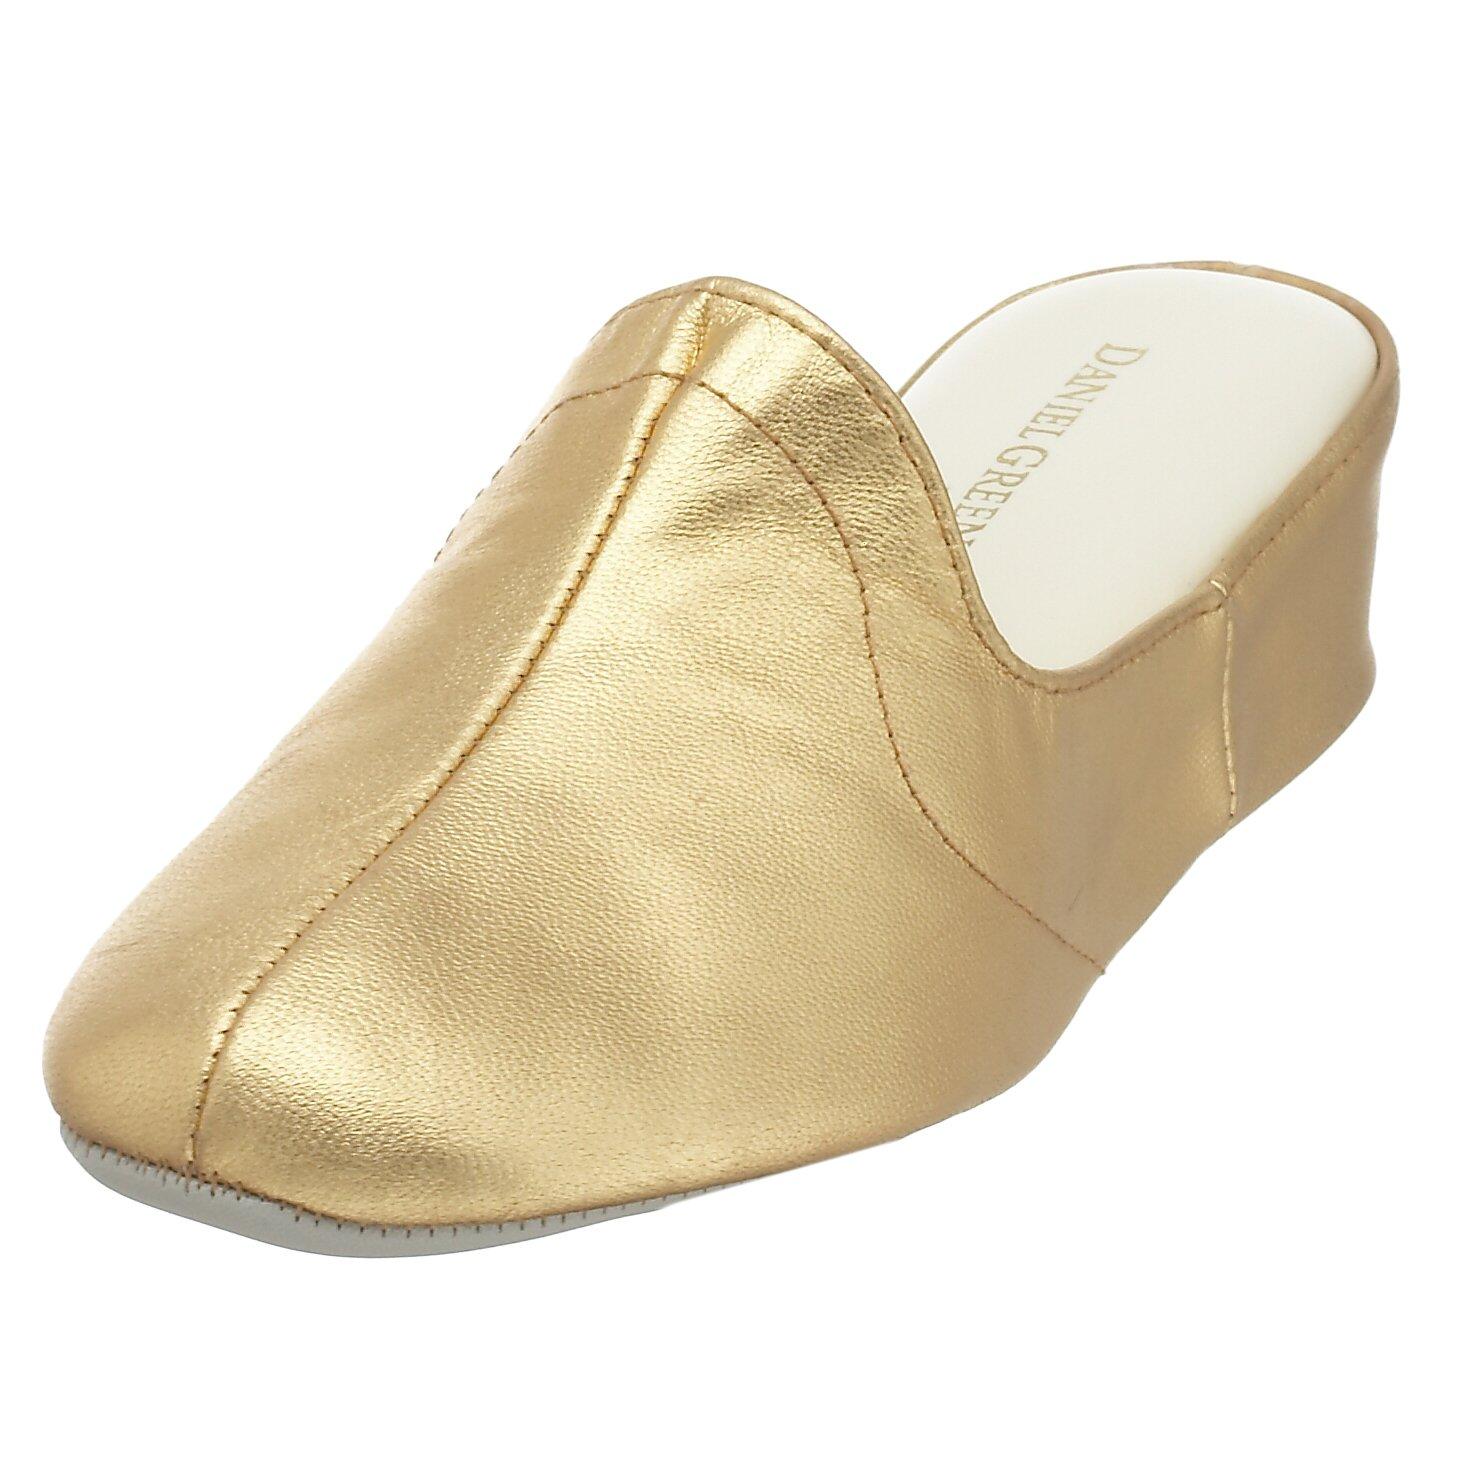 Daniel Green Women's Glamour Slipper B000FHZH9W 5.5 M US|Gold Kidskin